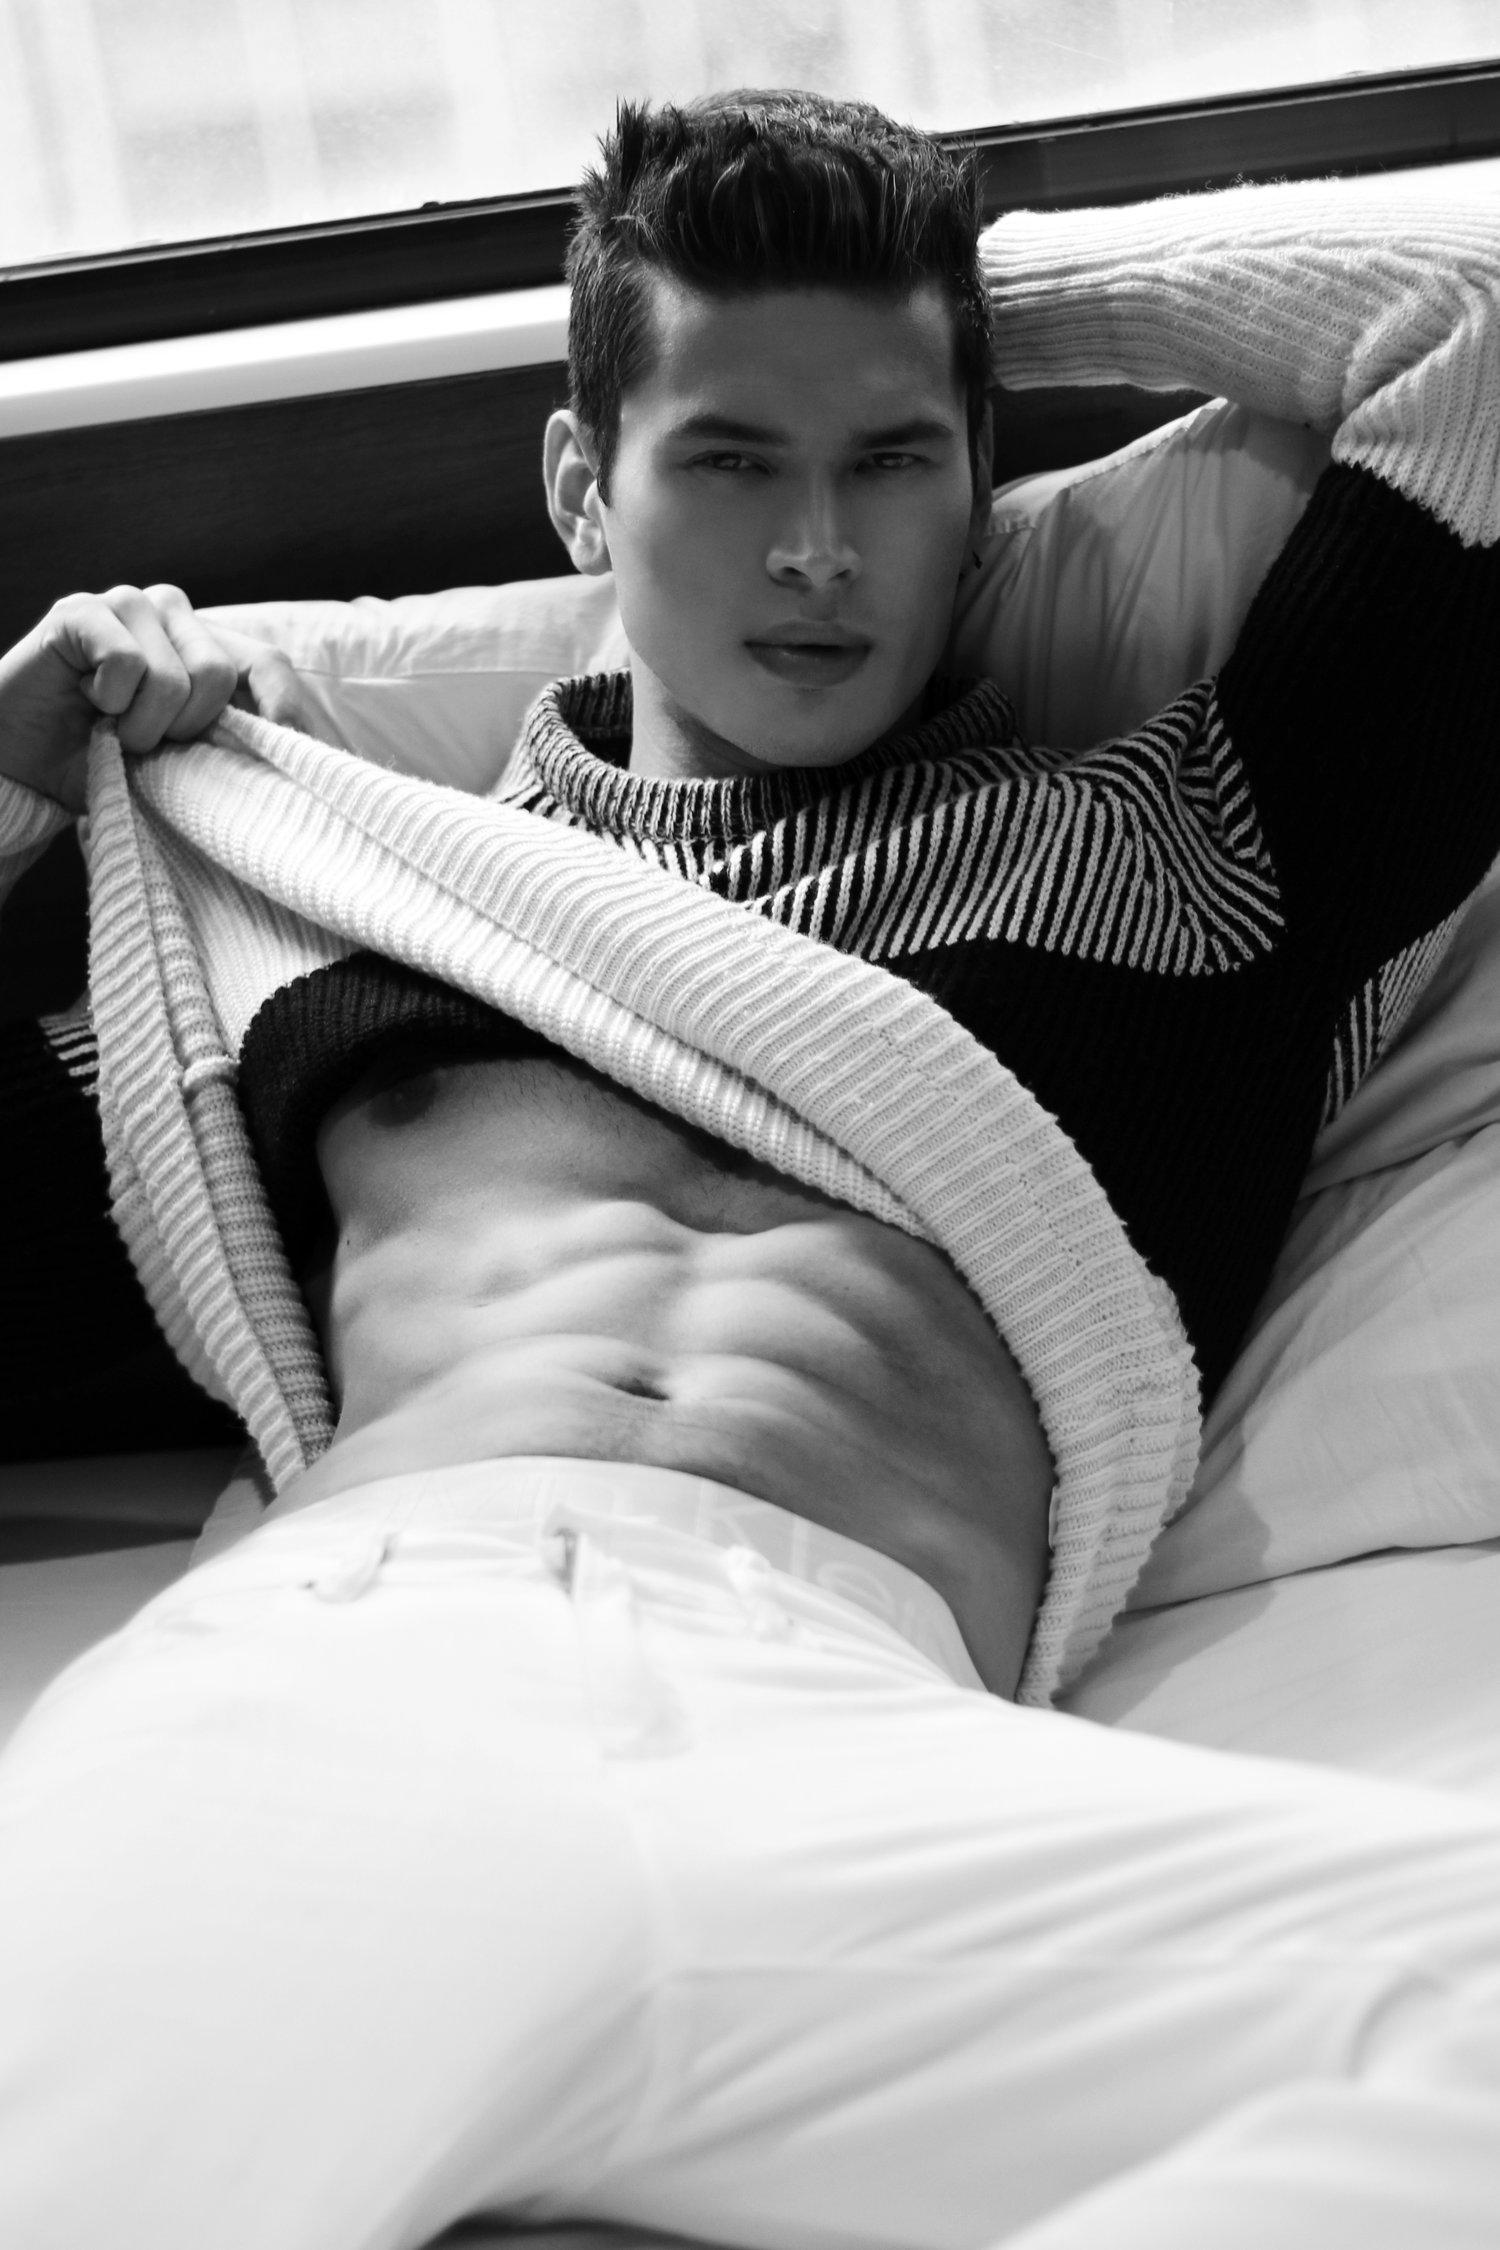 Adon Exclusive: Model Jeff Rodriguez By Paul dela Merced